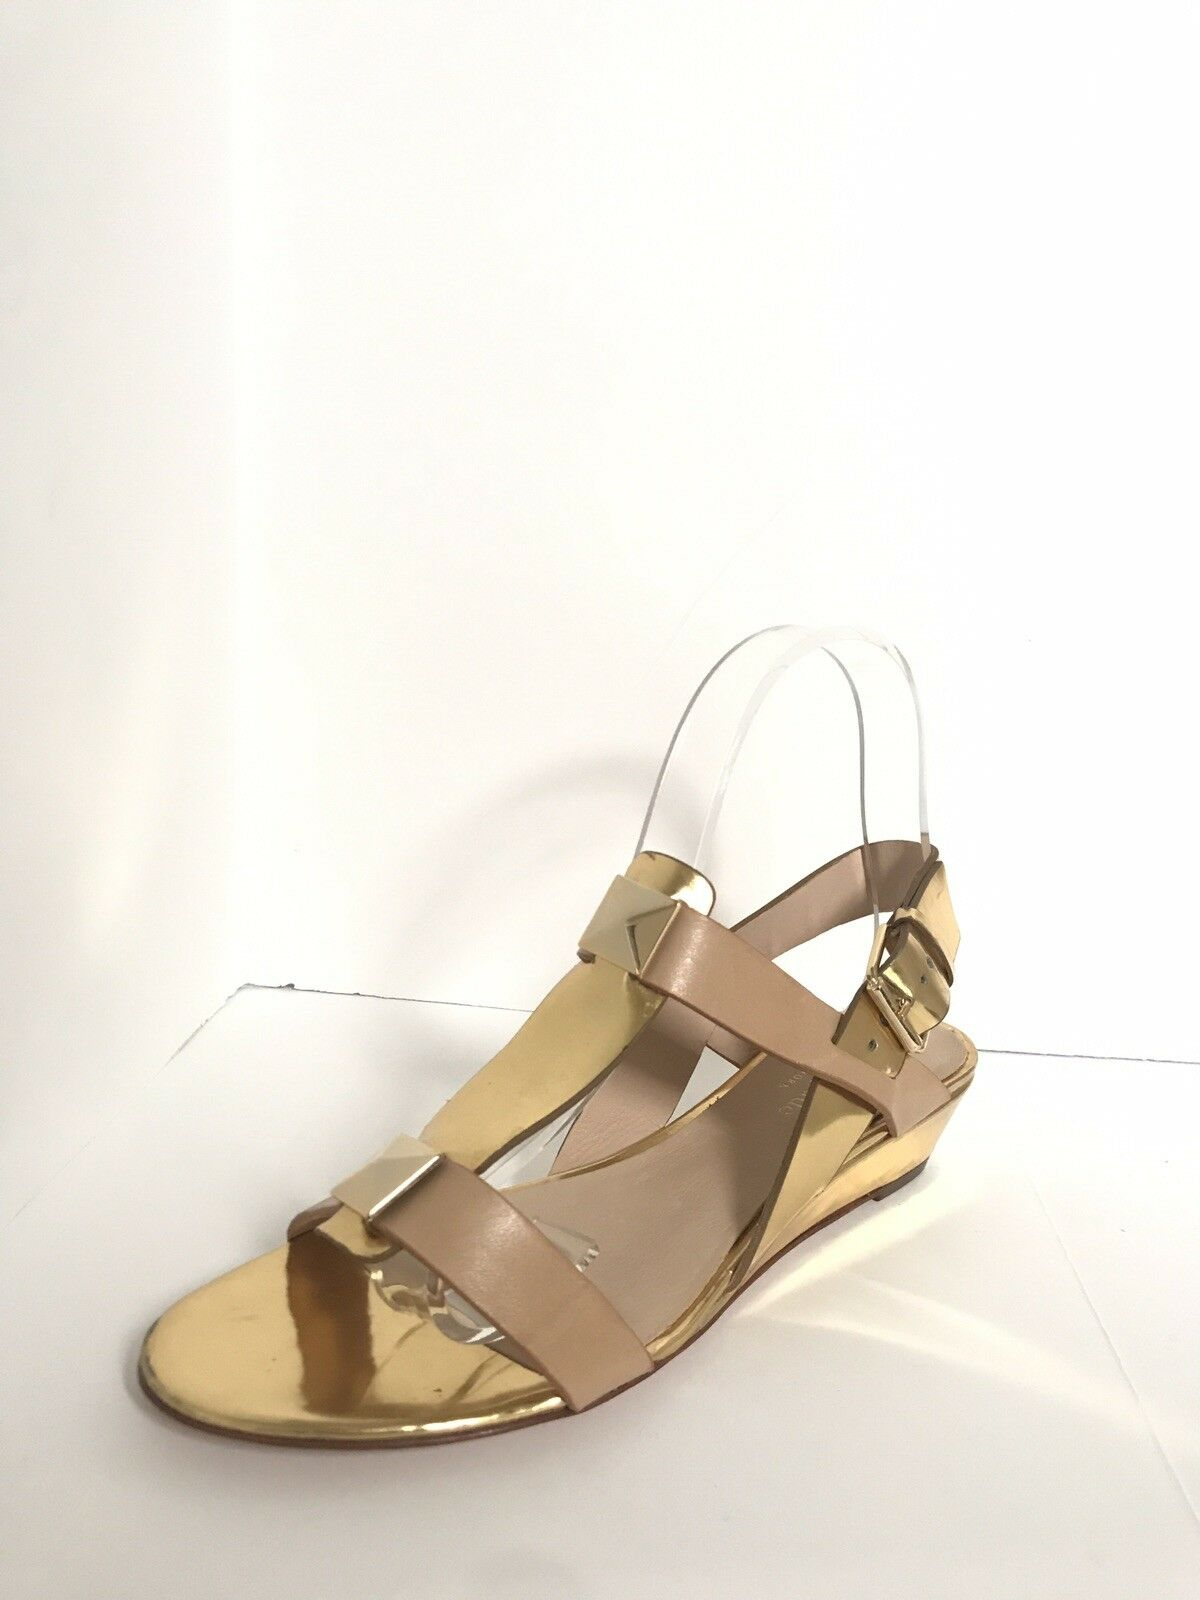 aefd2546079 CLOUDSTEPPERS CLARKS Caddell Petal Wedge Sandals Women 9 Sz 8.5